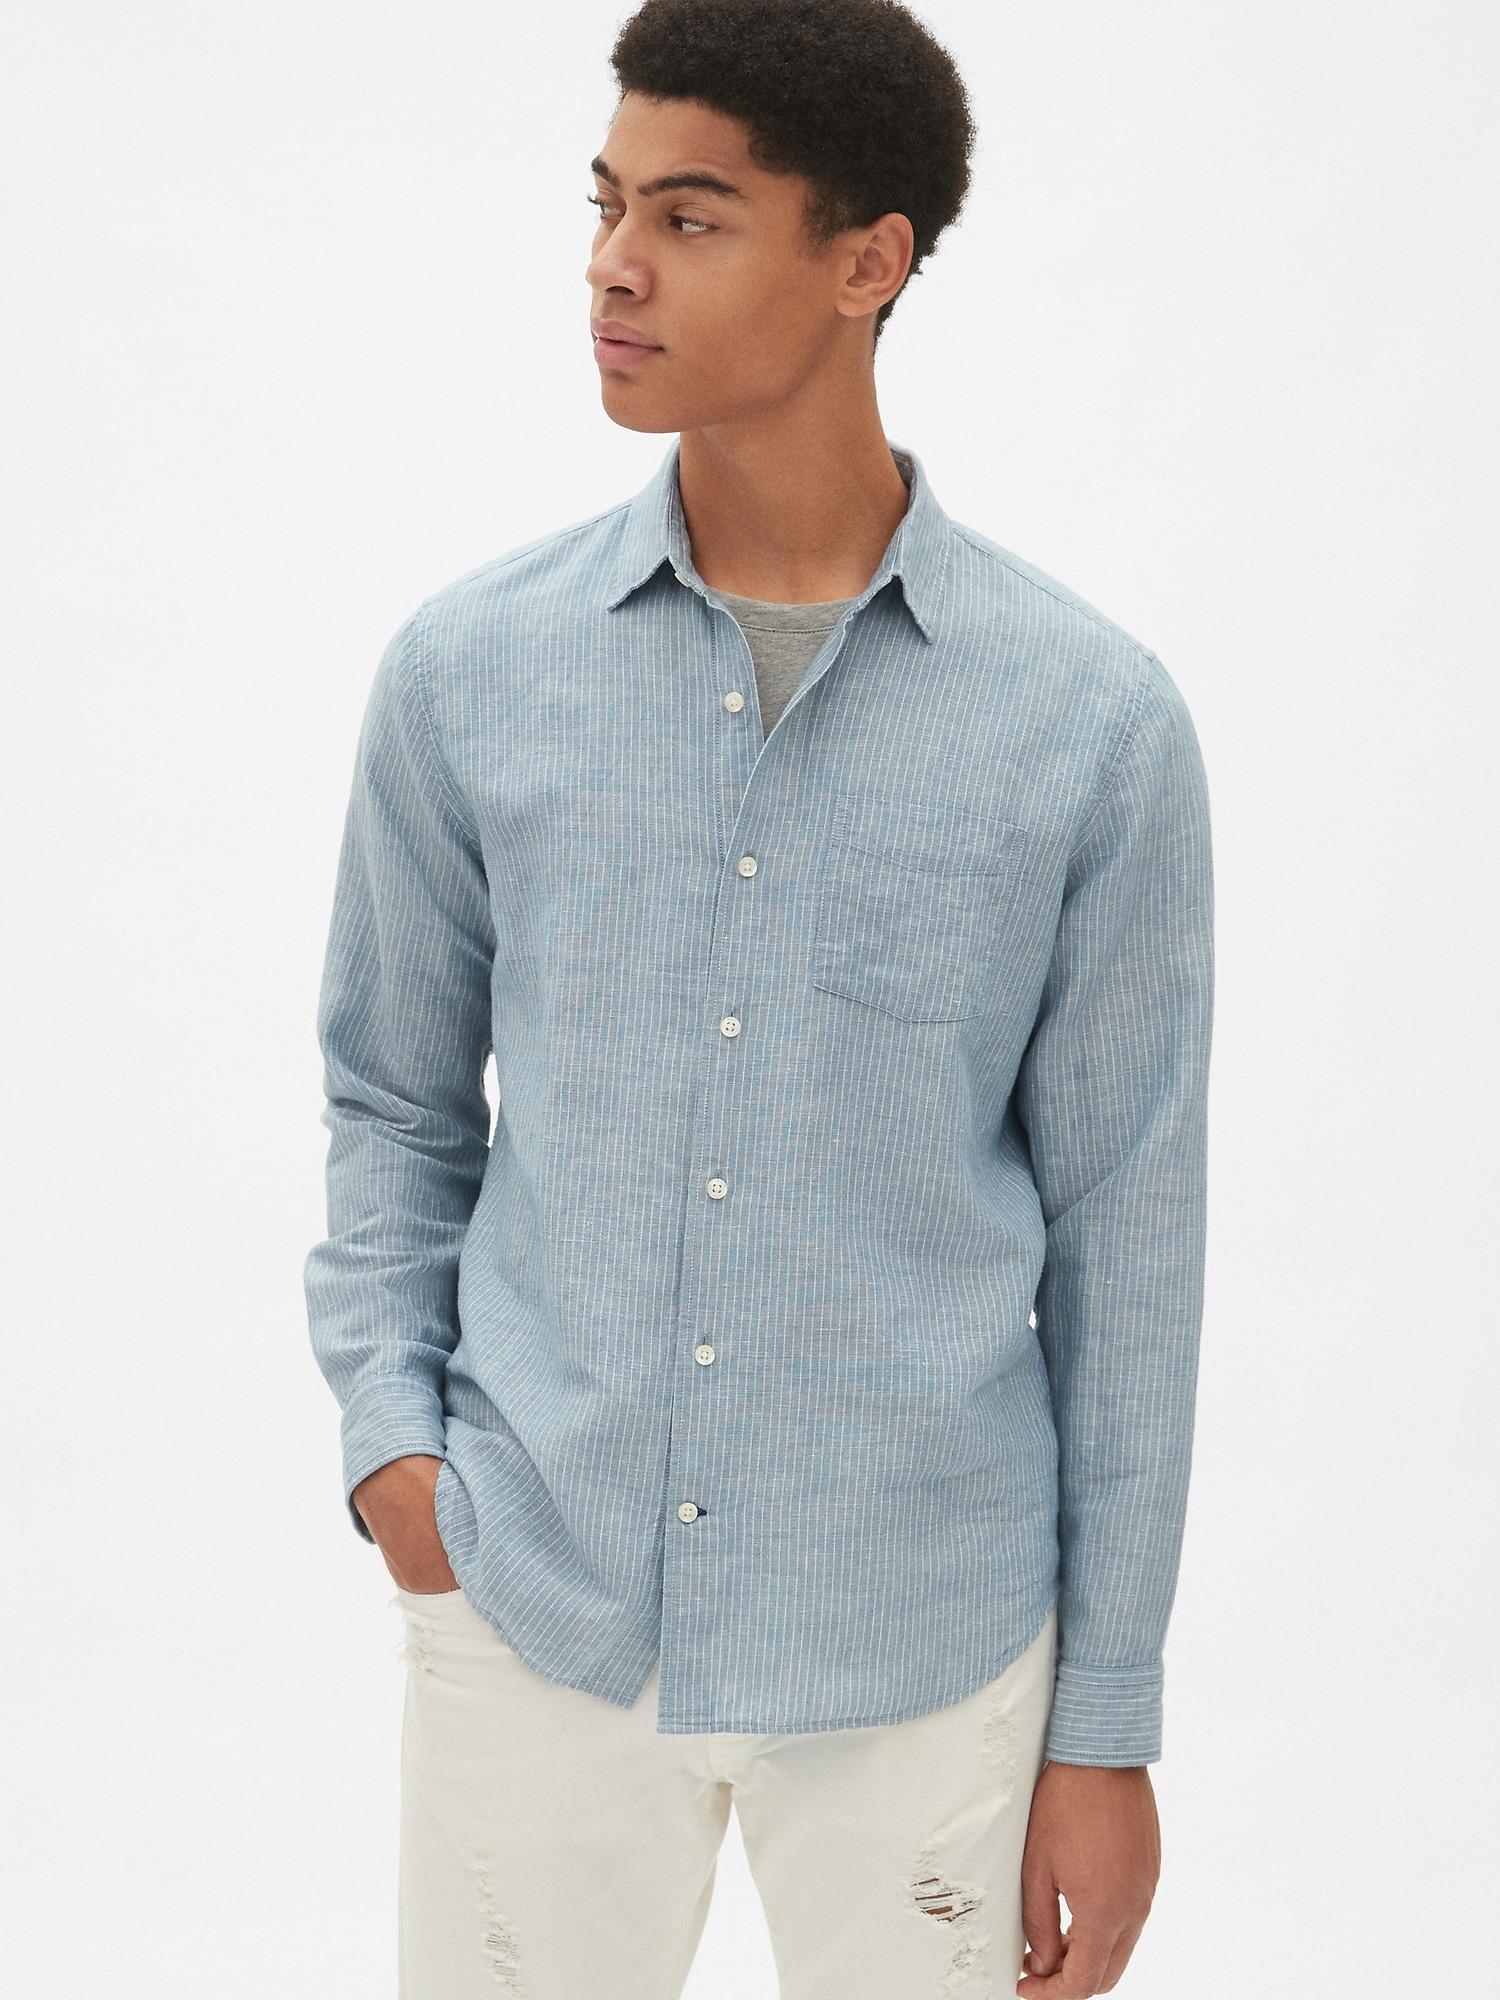 5367280ac3f Lyst - Gap Standard Fit Shirt In Linen-cotton in Blue for Men